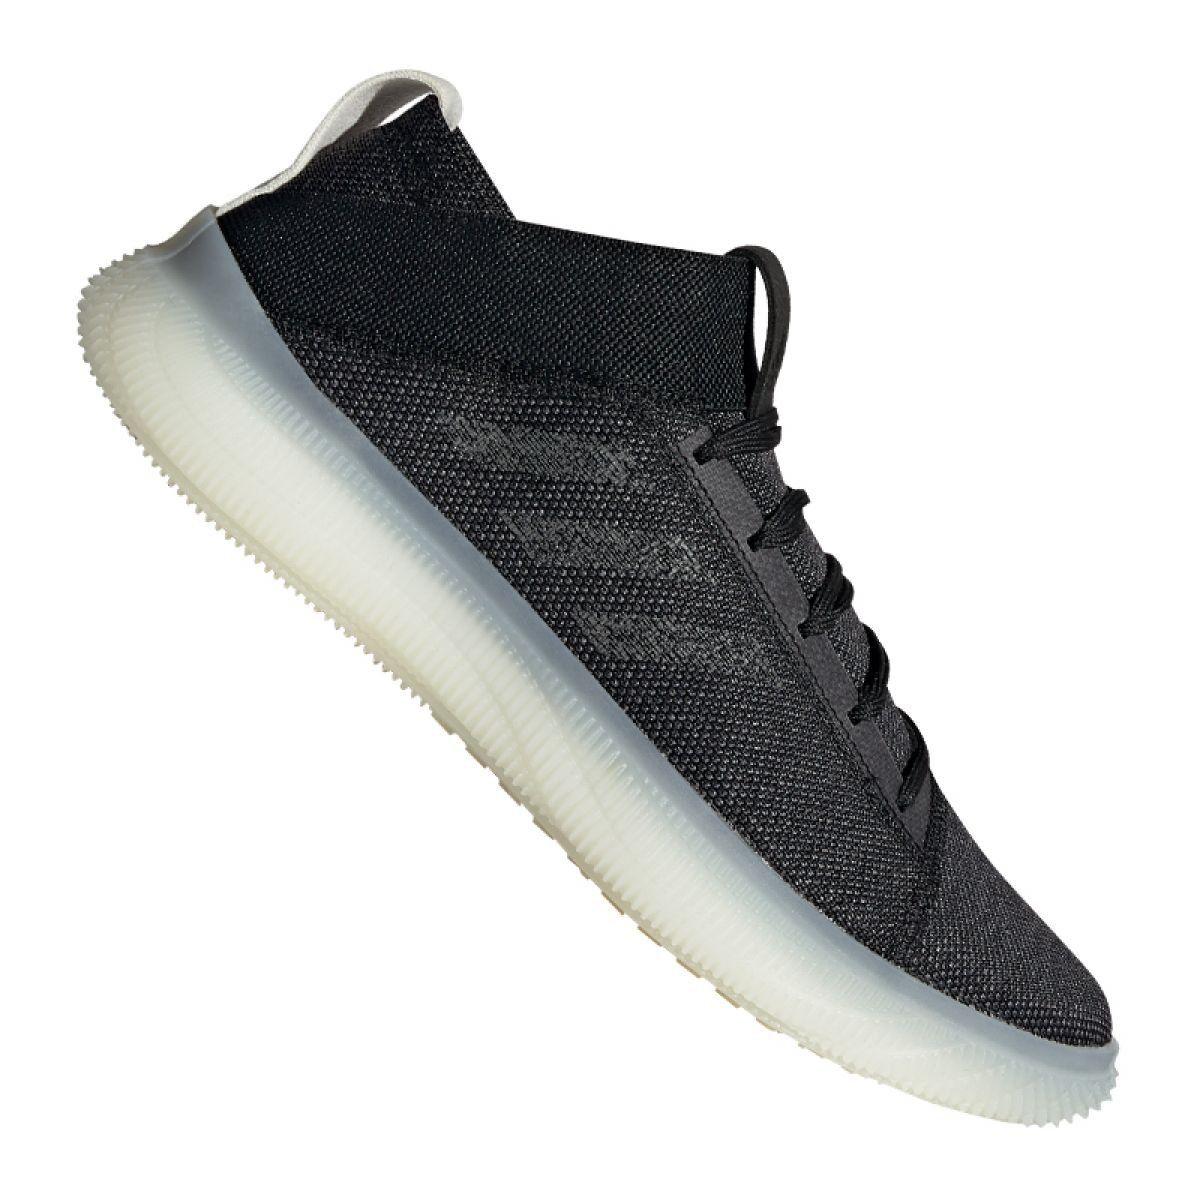 Adidas PureBOOST Trainer M DB3389 shoes